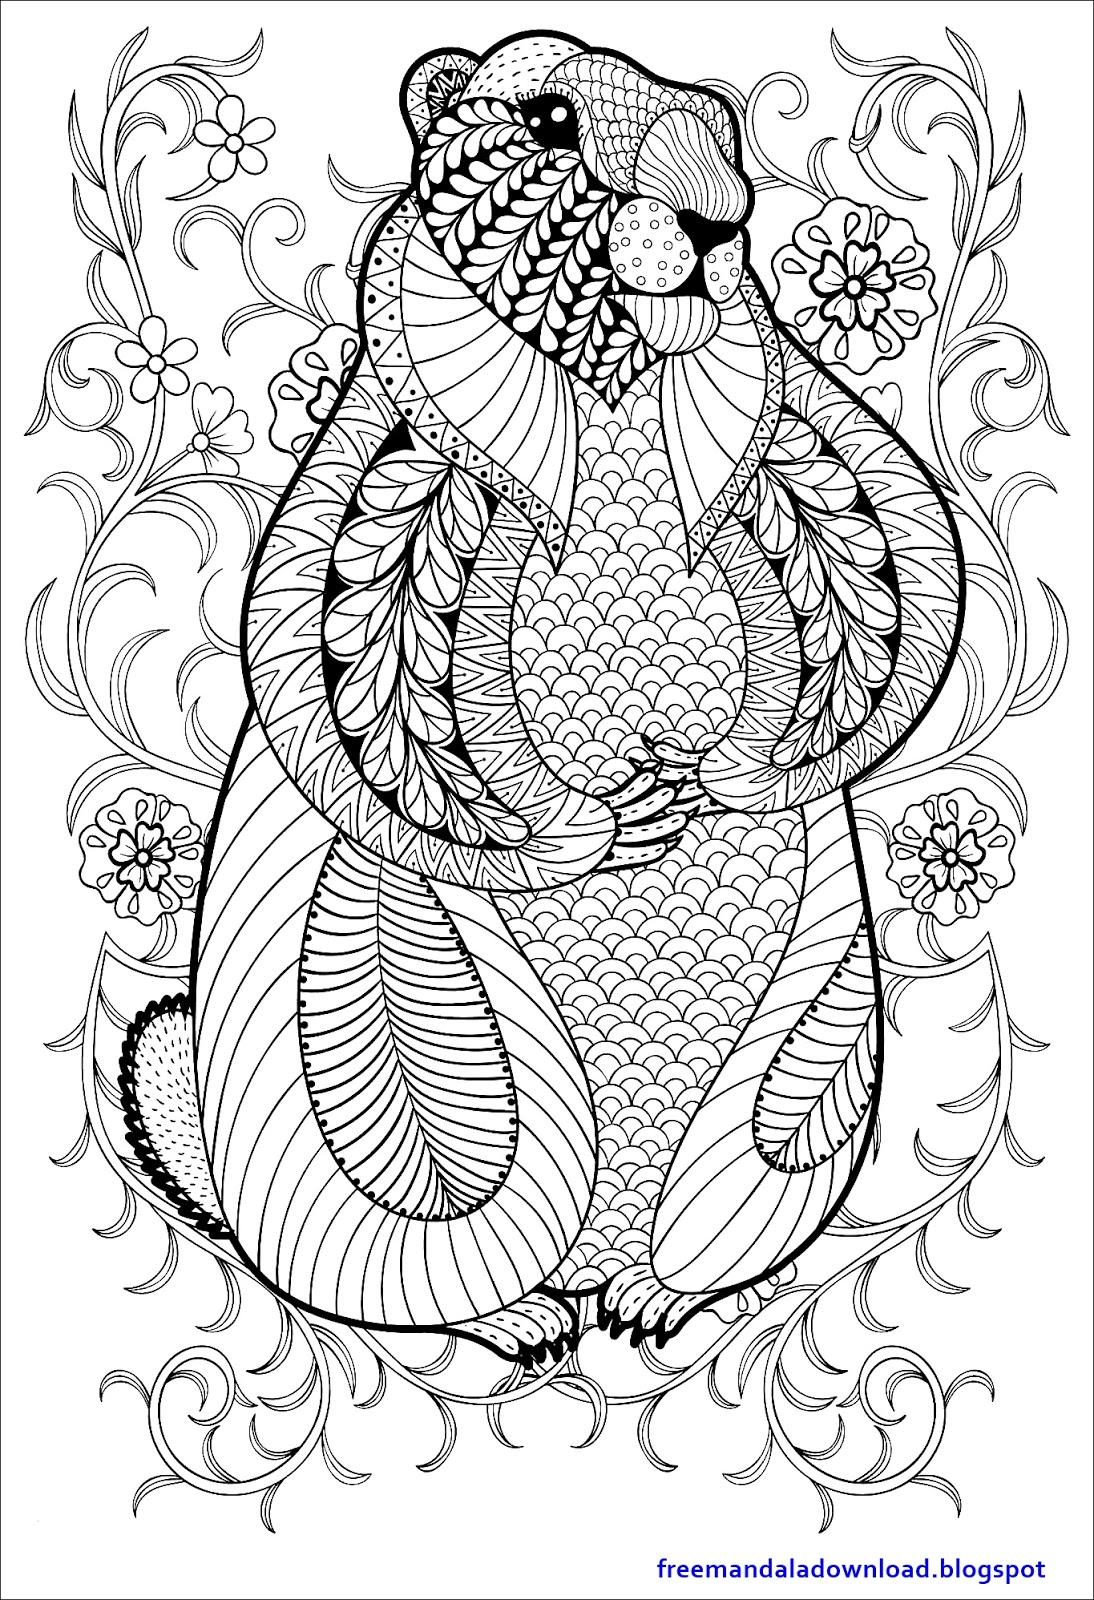 Free Mandala Schwierige Erwachsene Farbseite Mandala Pdf